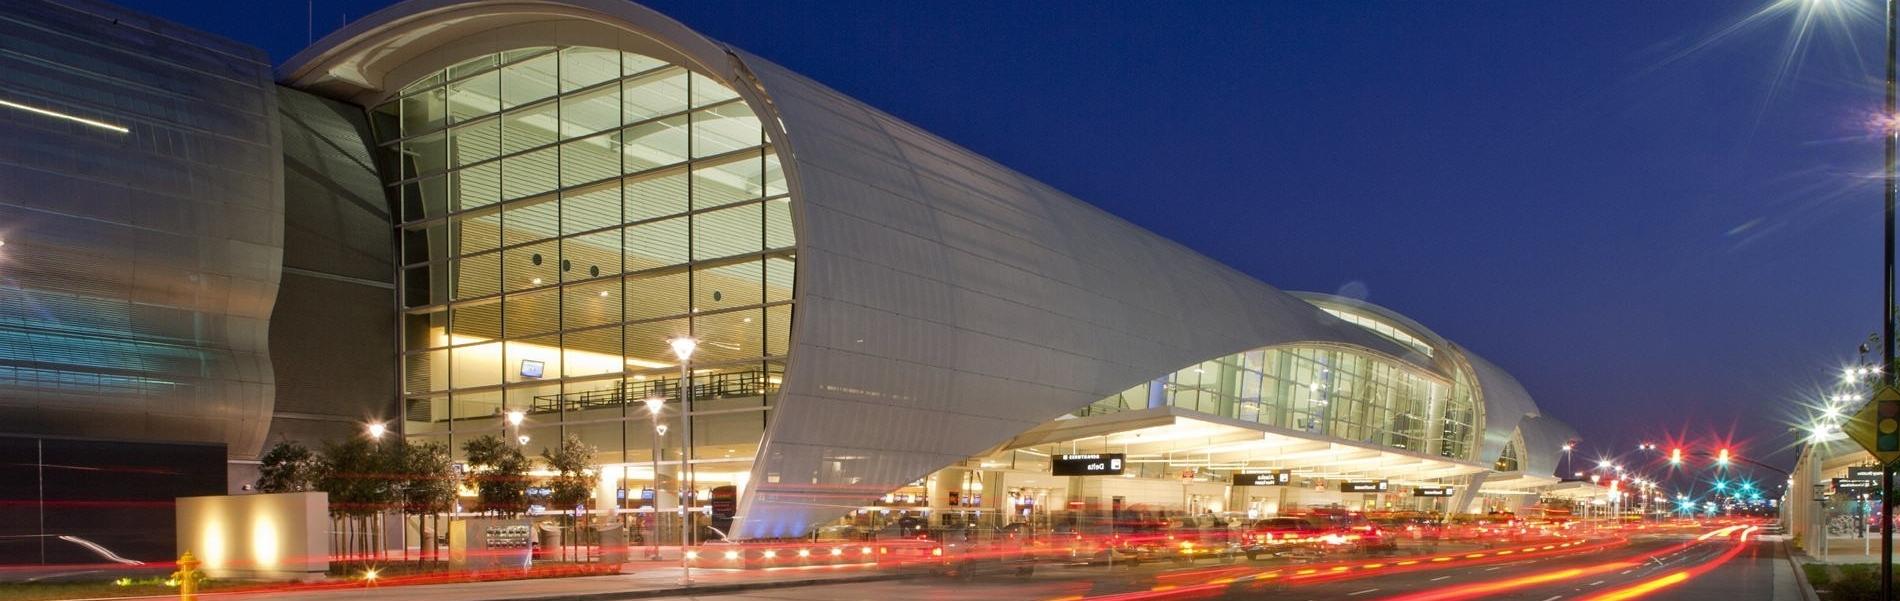 San Jose Airports | Northern California Airports | San Jose Transportation